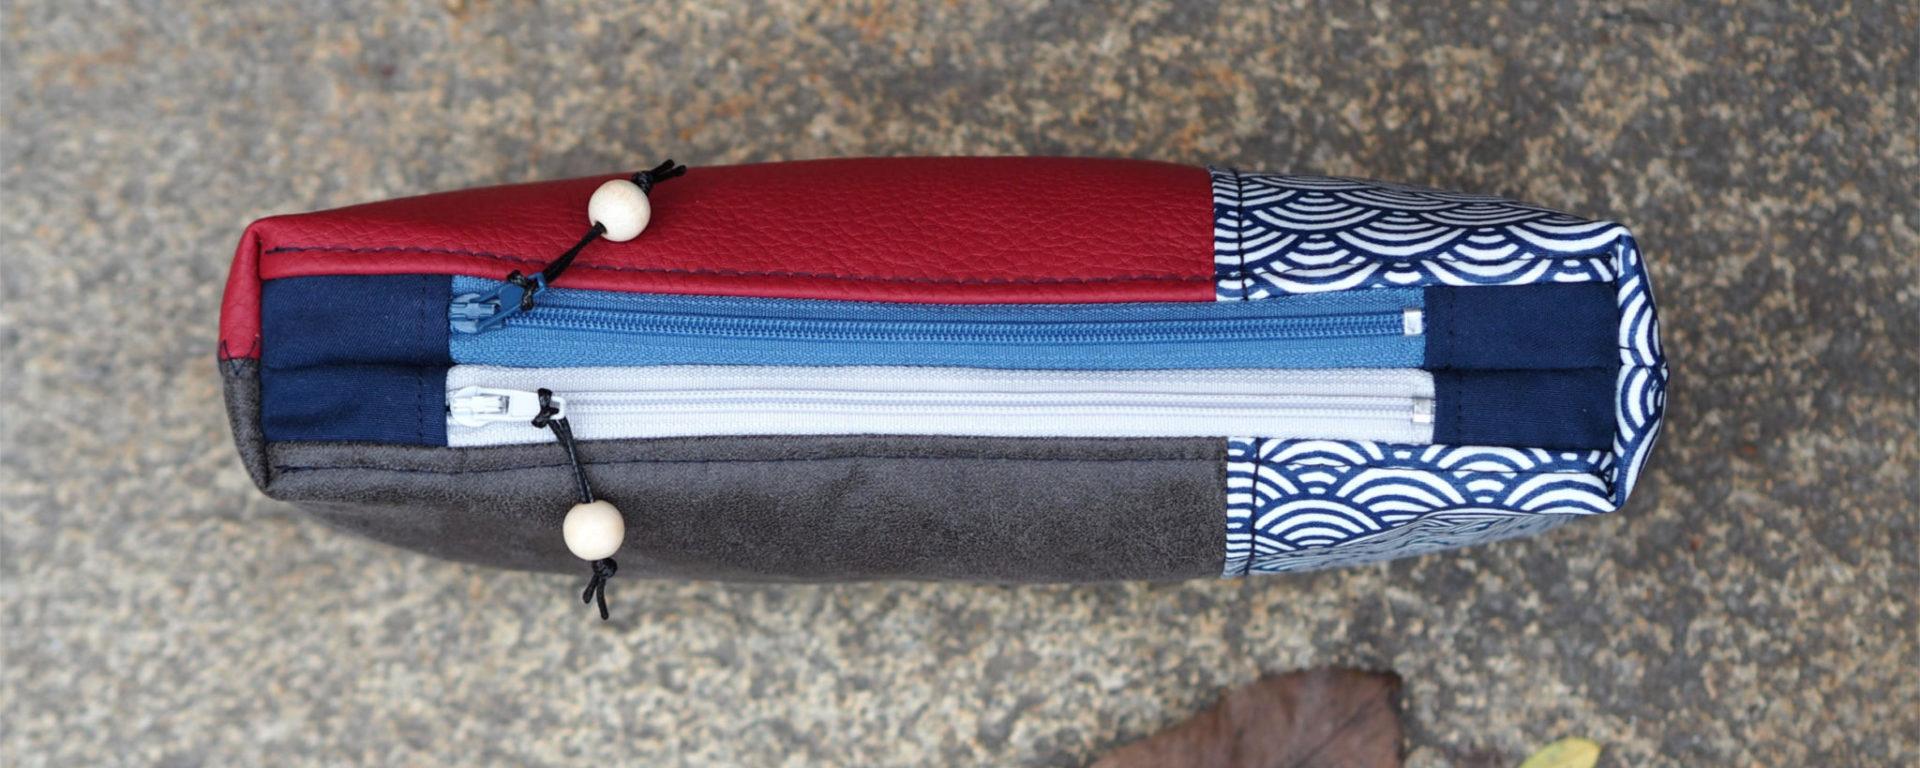 Tutorial Doppel Reißverschluss Täschchen weisnähschen nähen 12